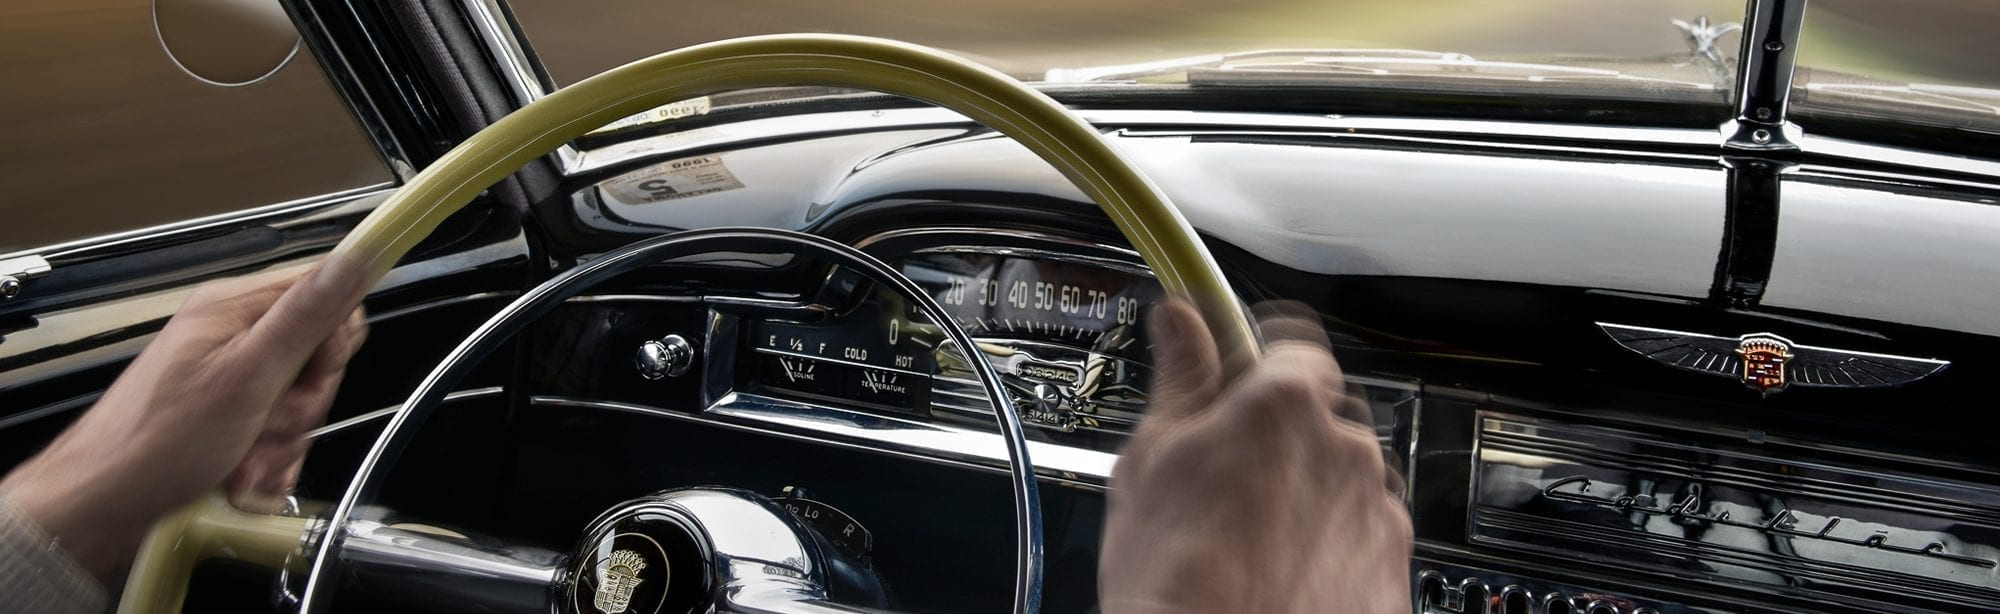 1949 Cadillac Series 62 Fastback